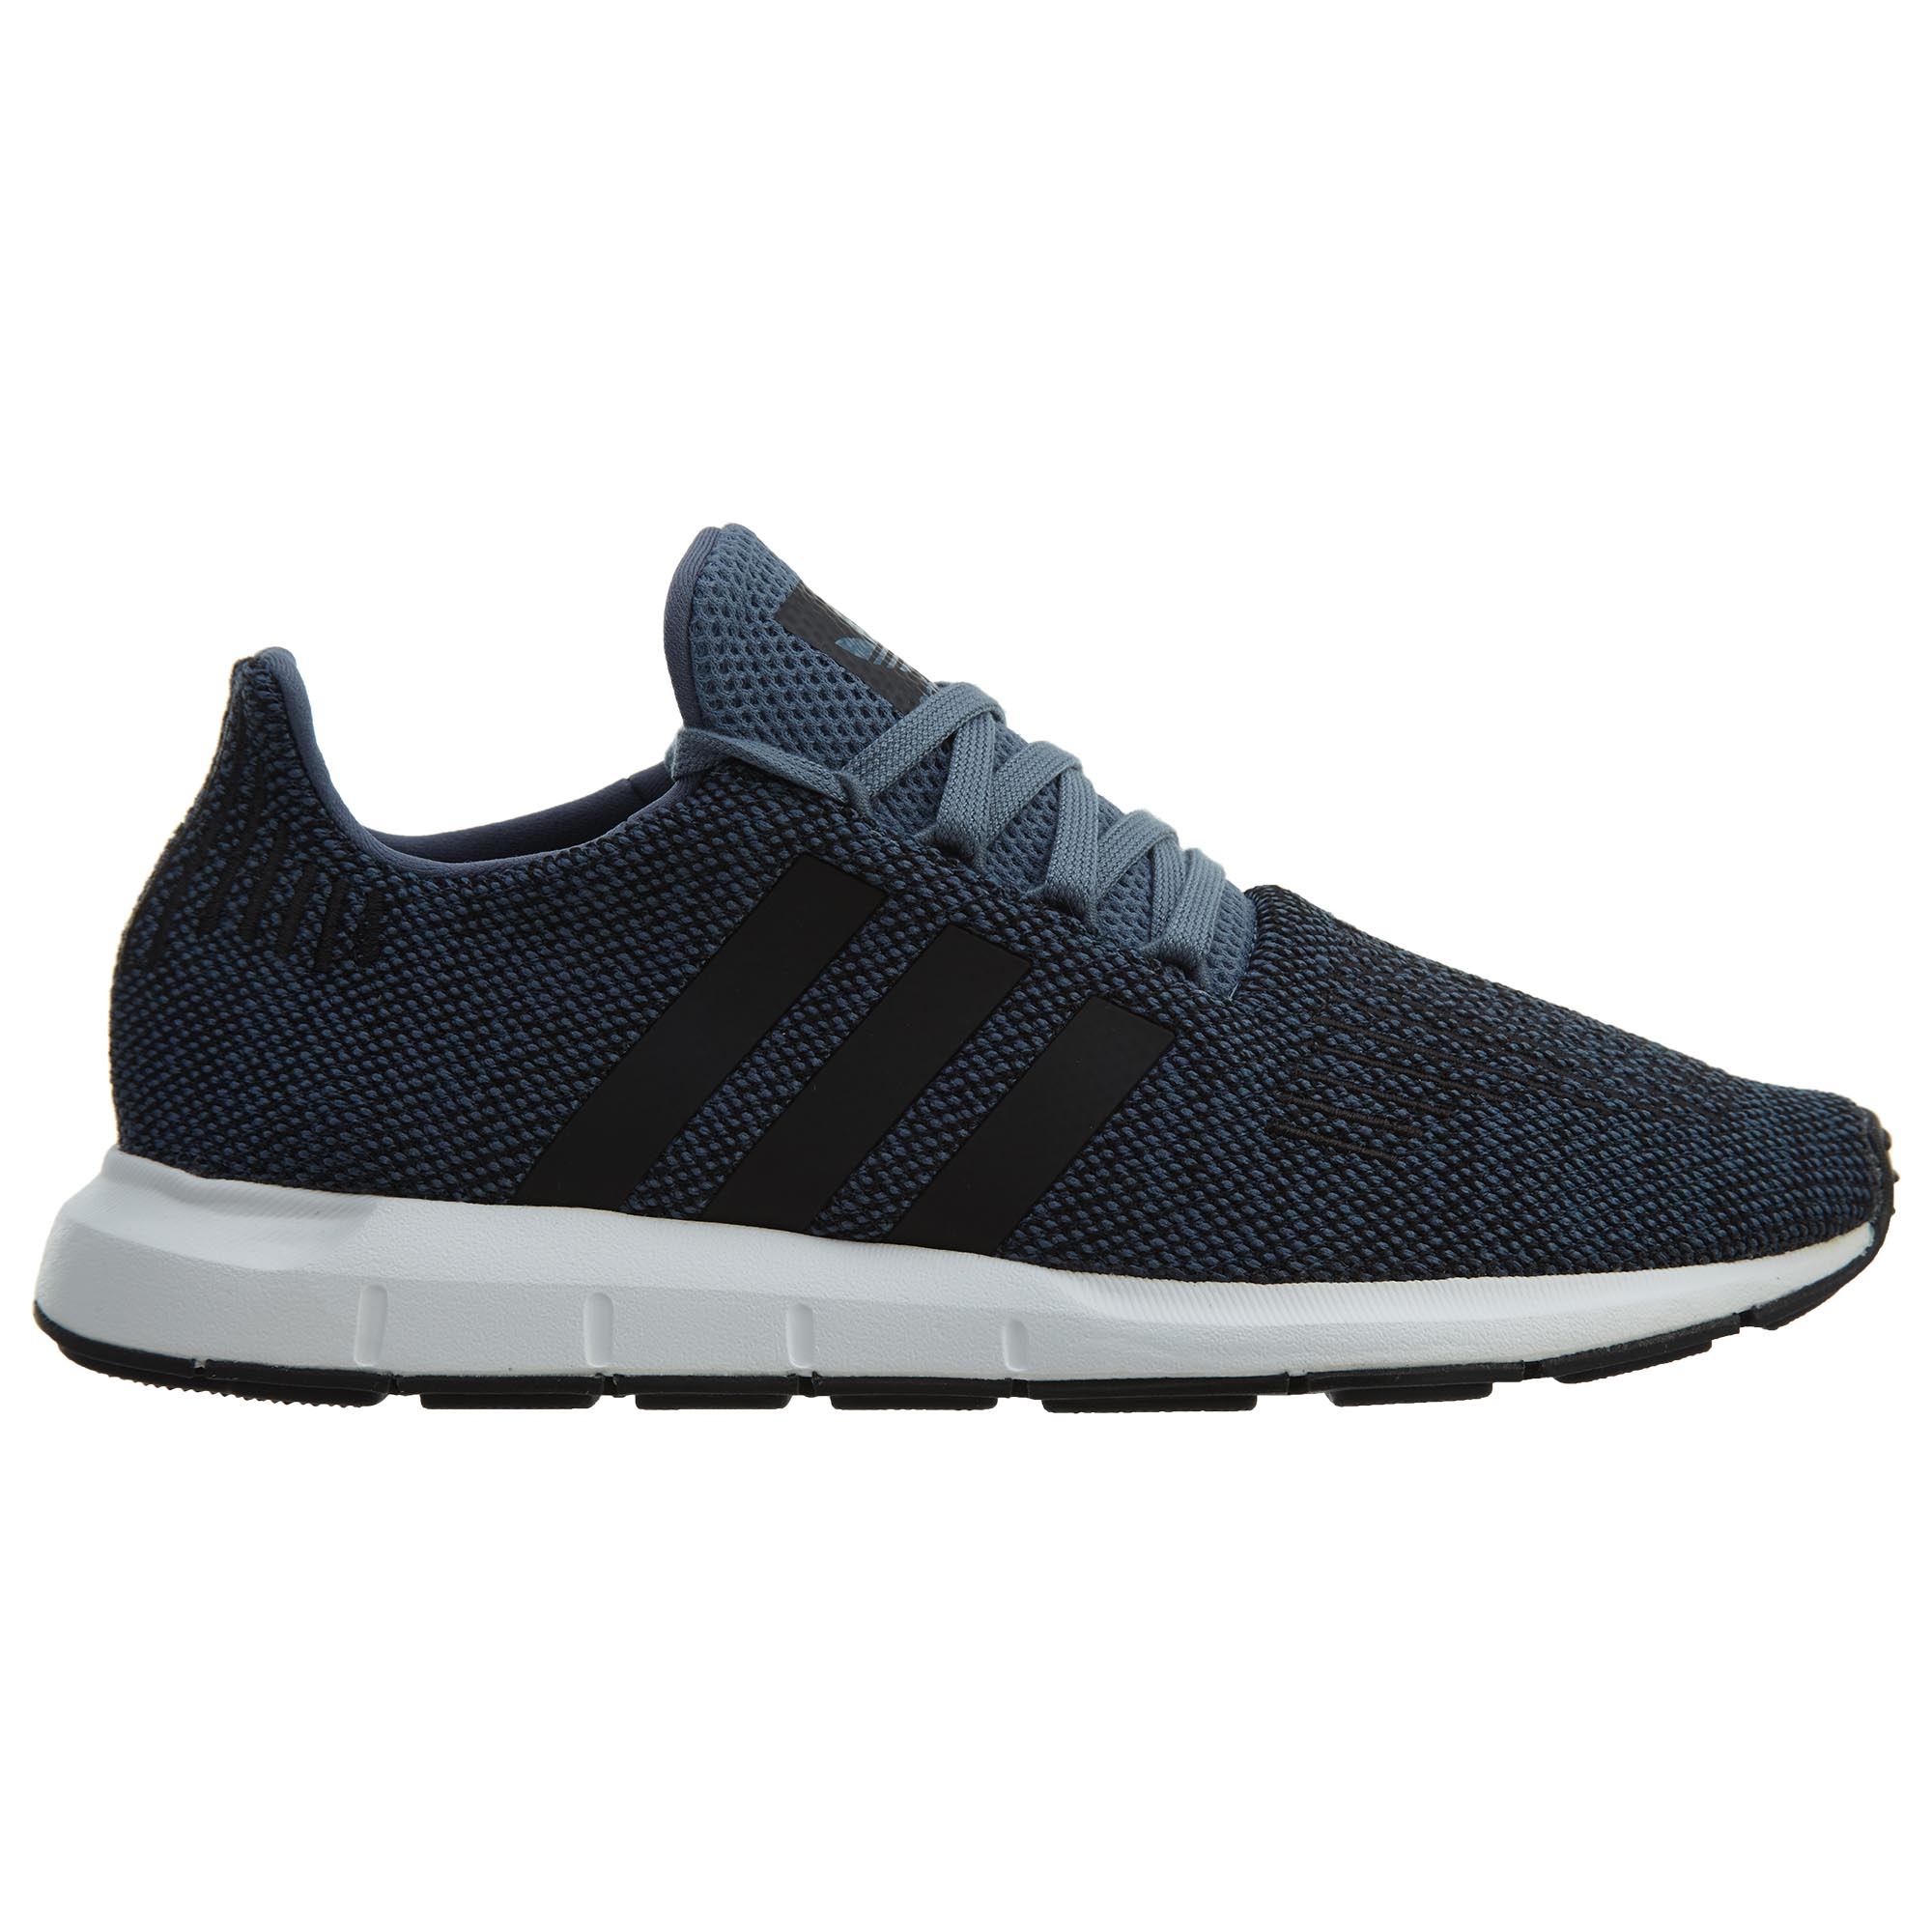 Pre-Owned Adidas Originals Swift Run